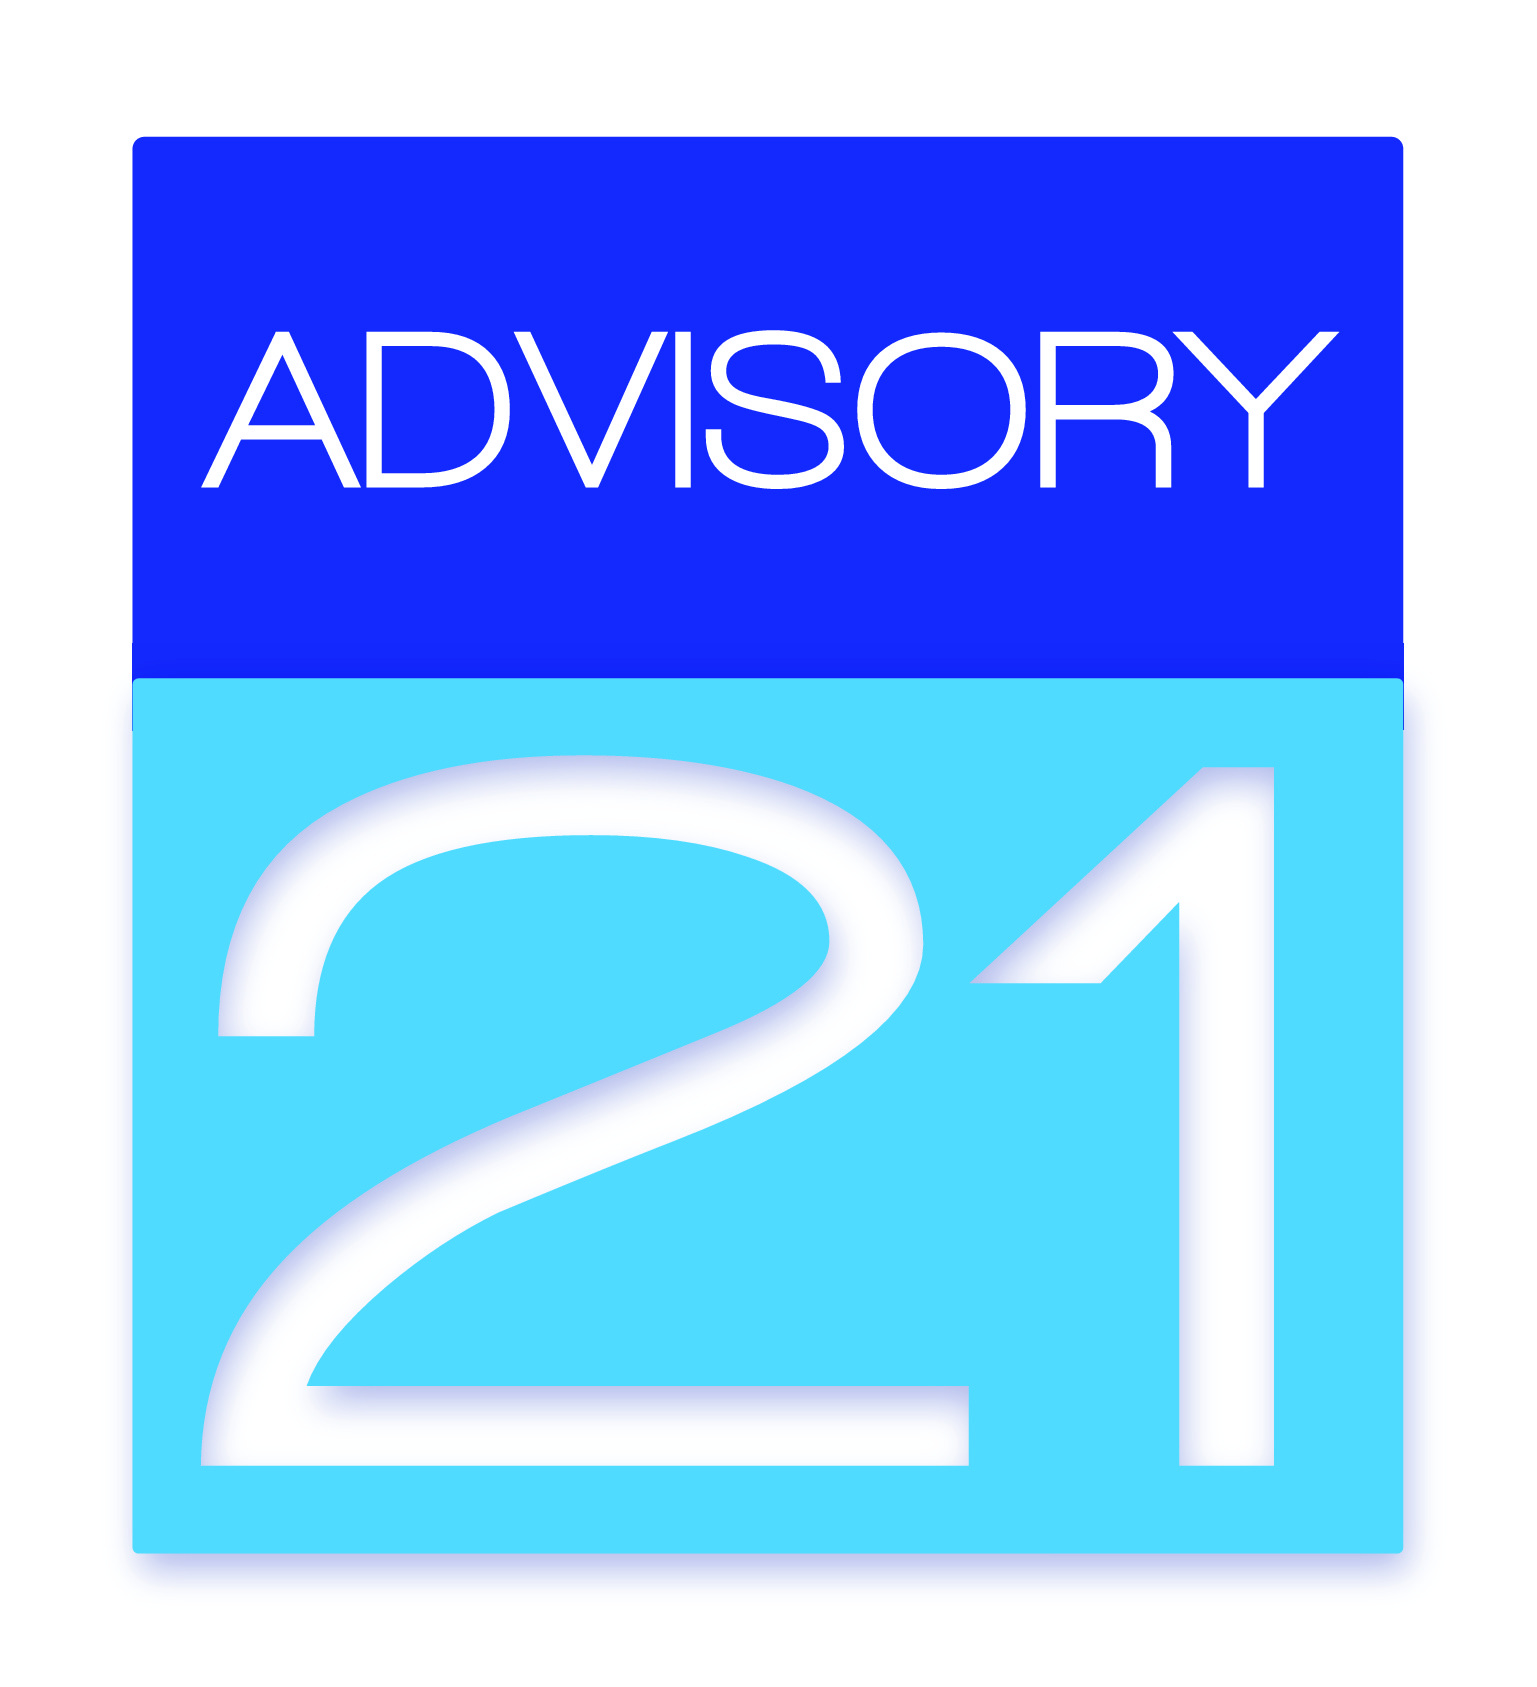 Advisory 21